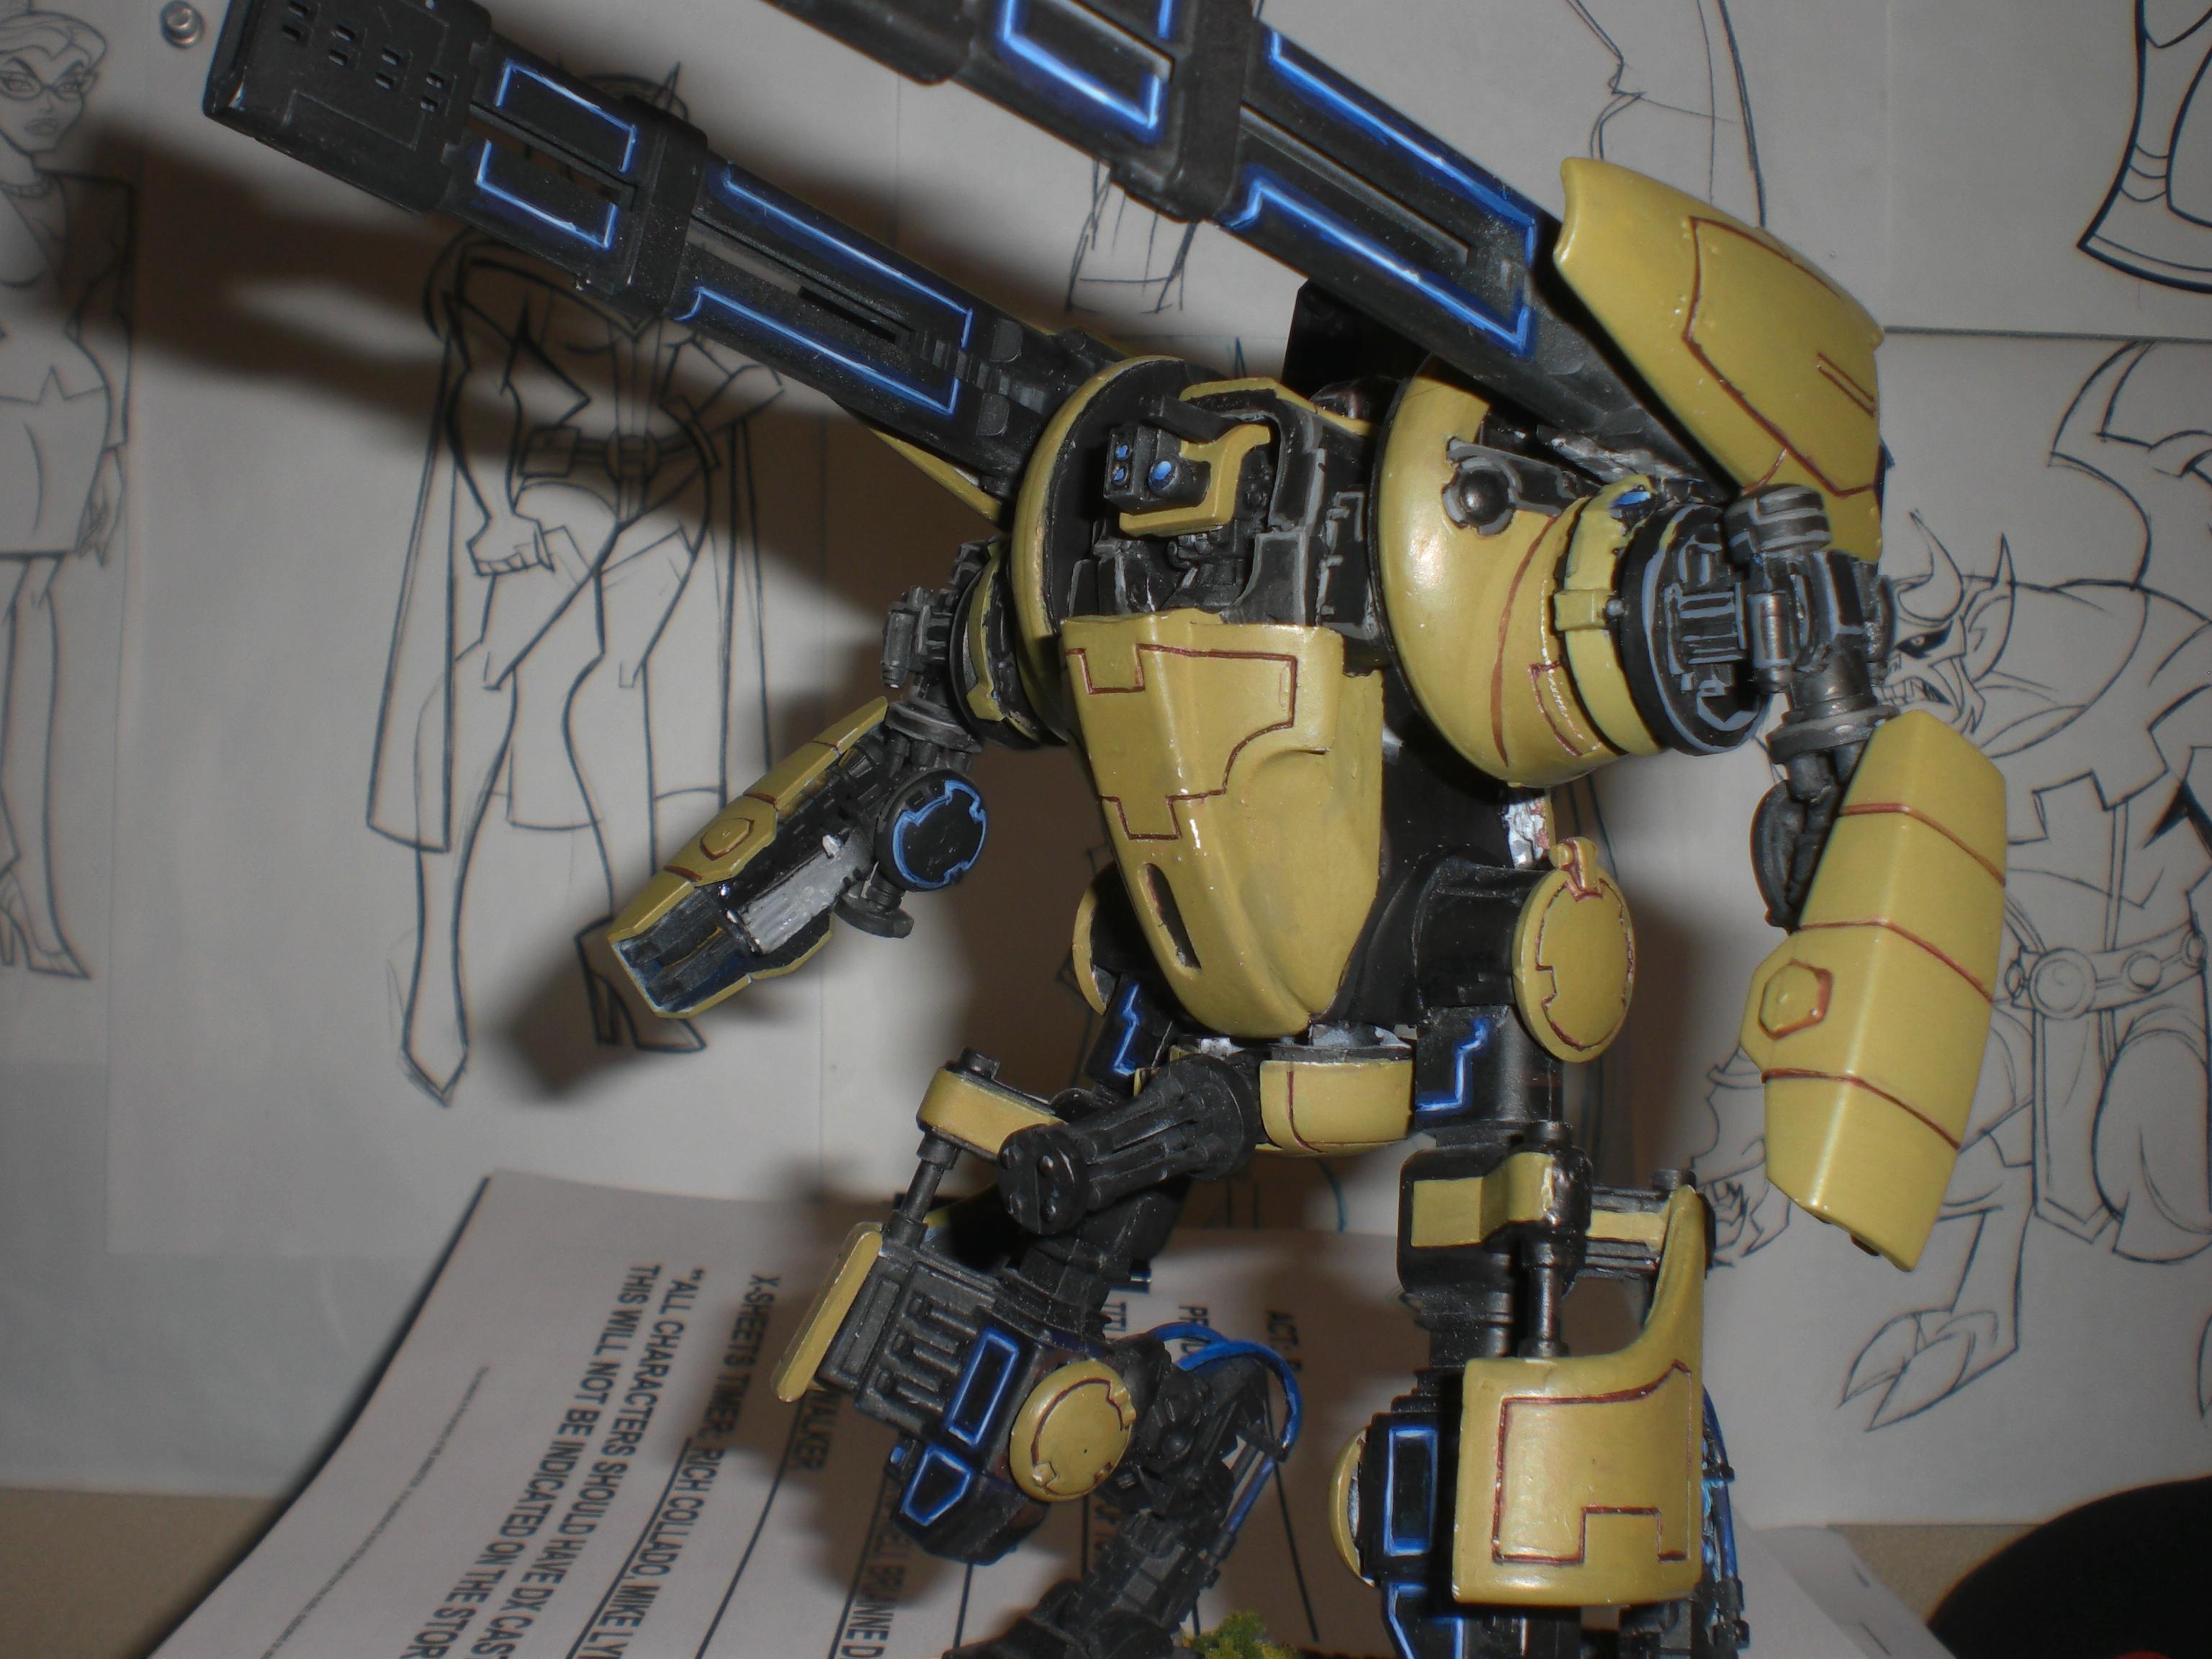 Battlesuit, Hammerhead, Railgun, Tau, Transformer